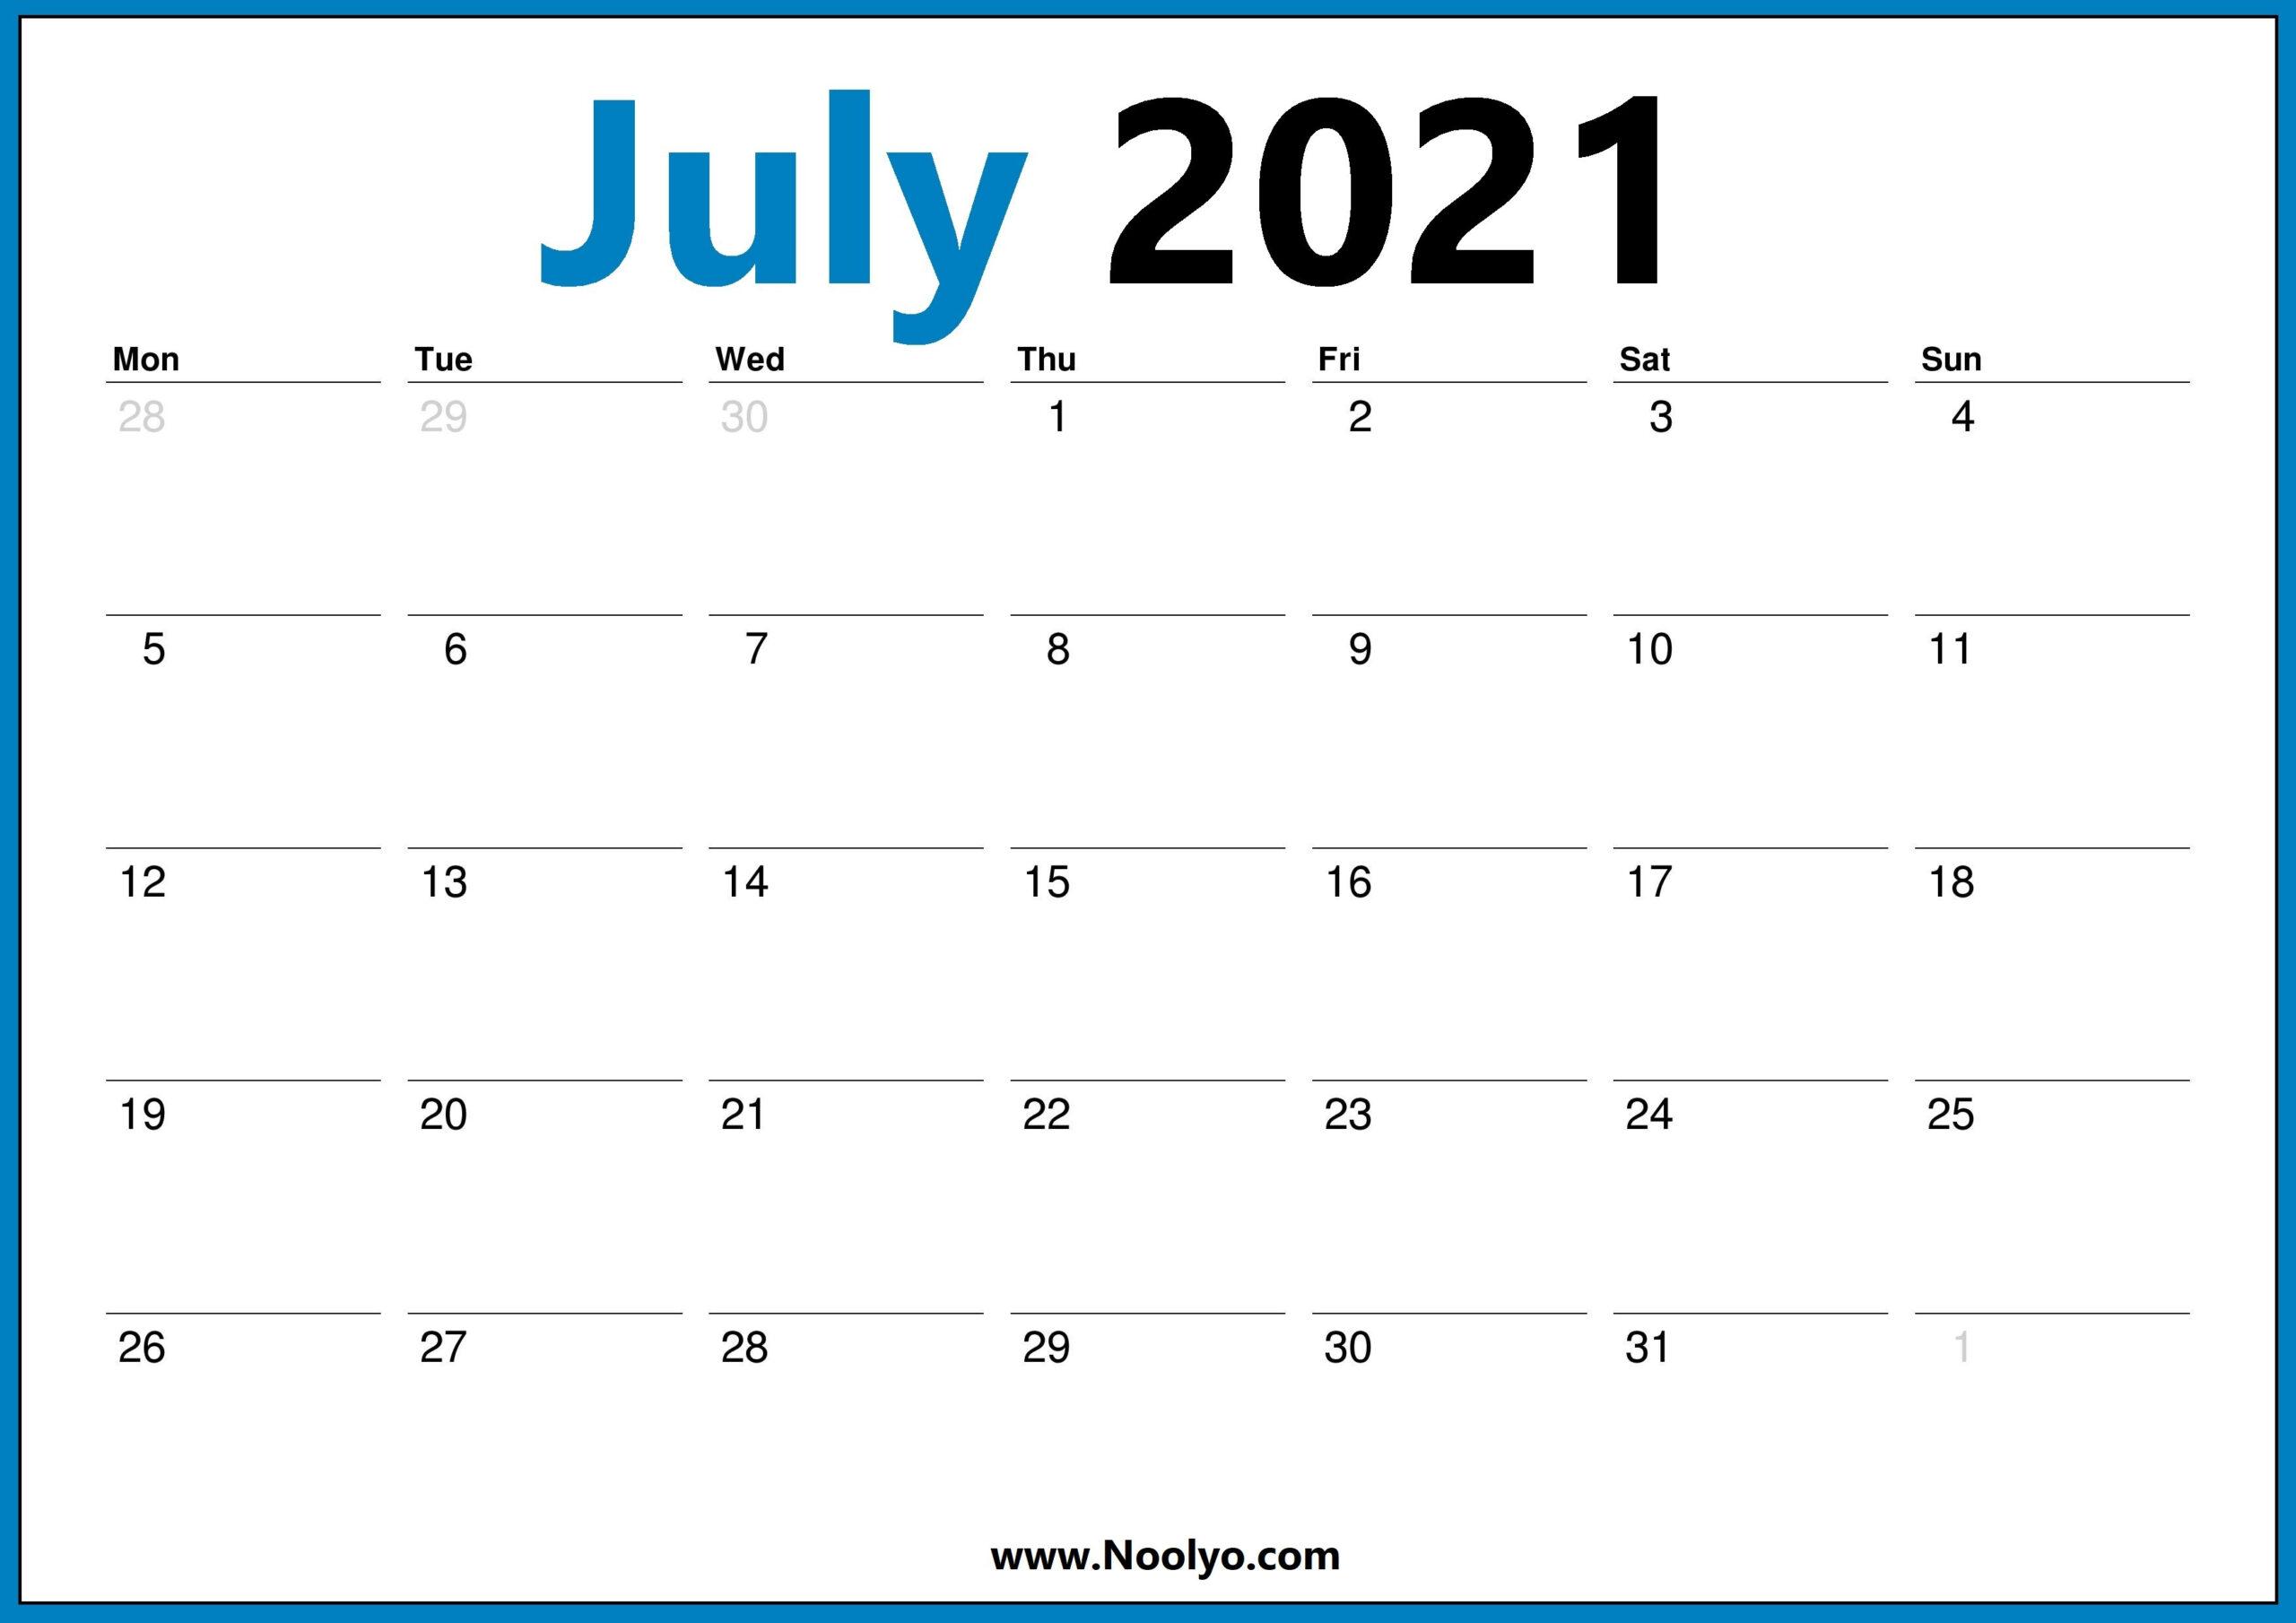 July 2021 Monday Start Calendar Printable Free Download-Printable Monday - Friday July 2021